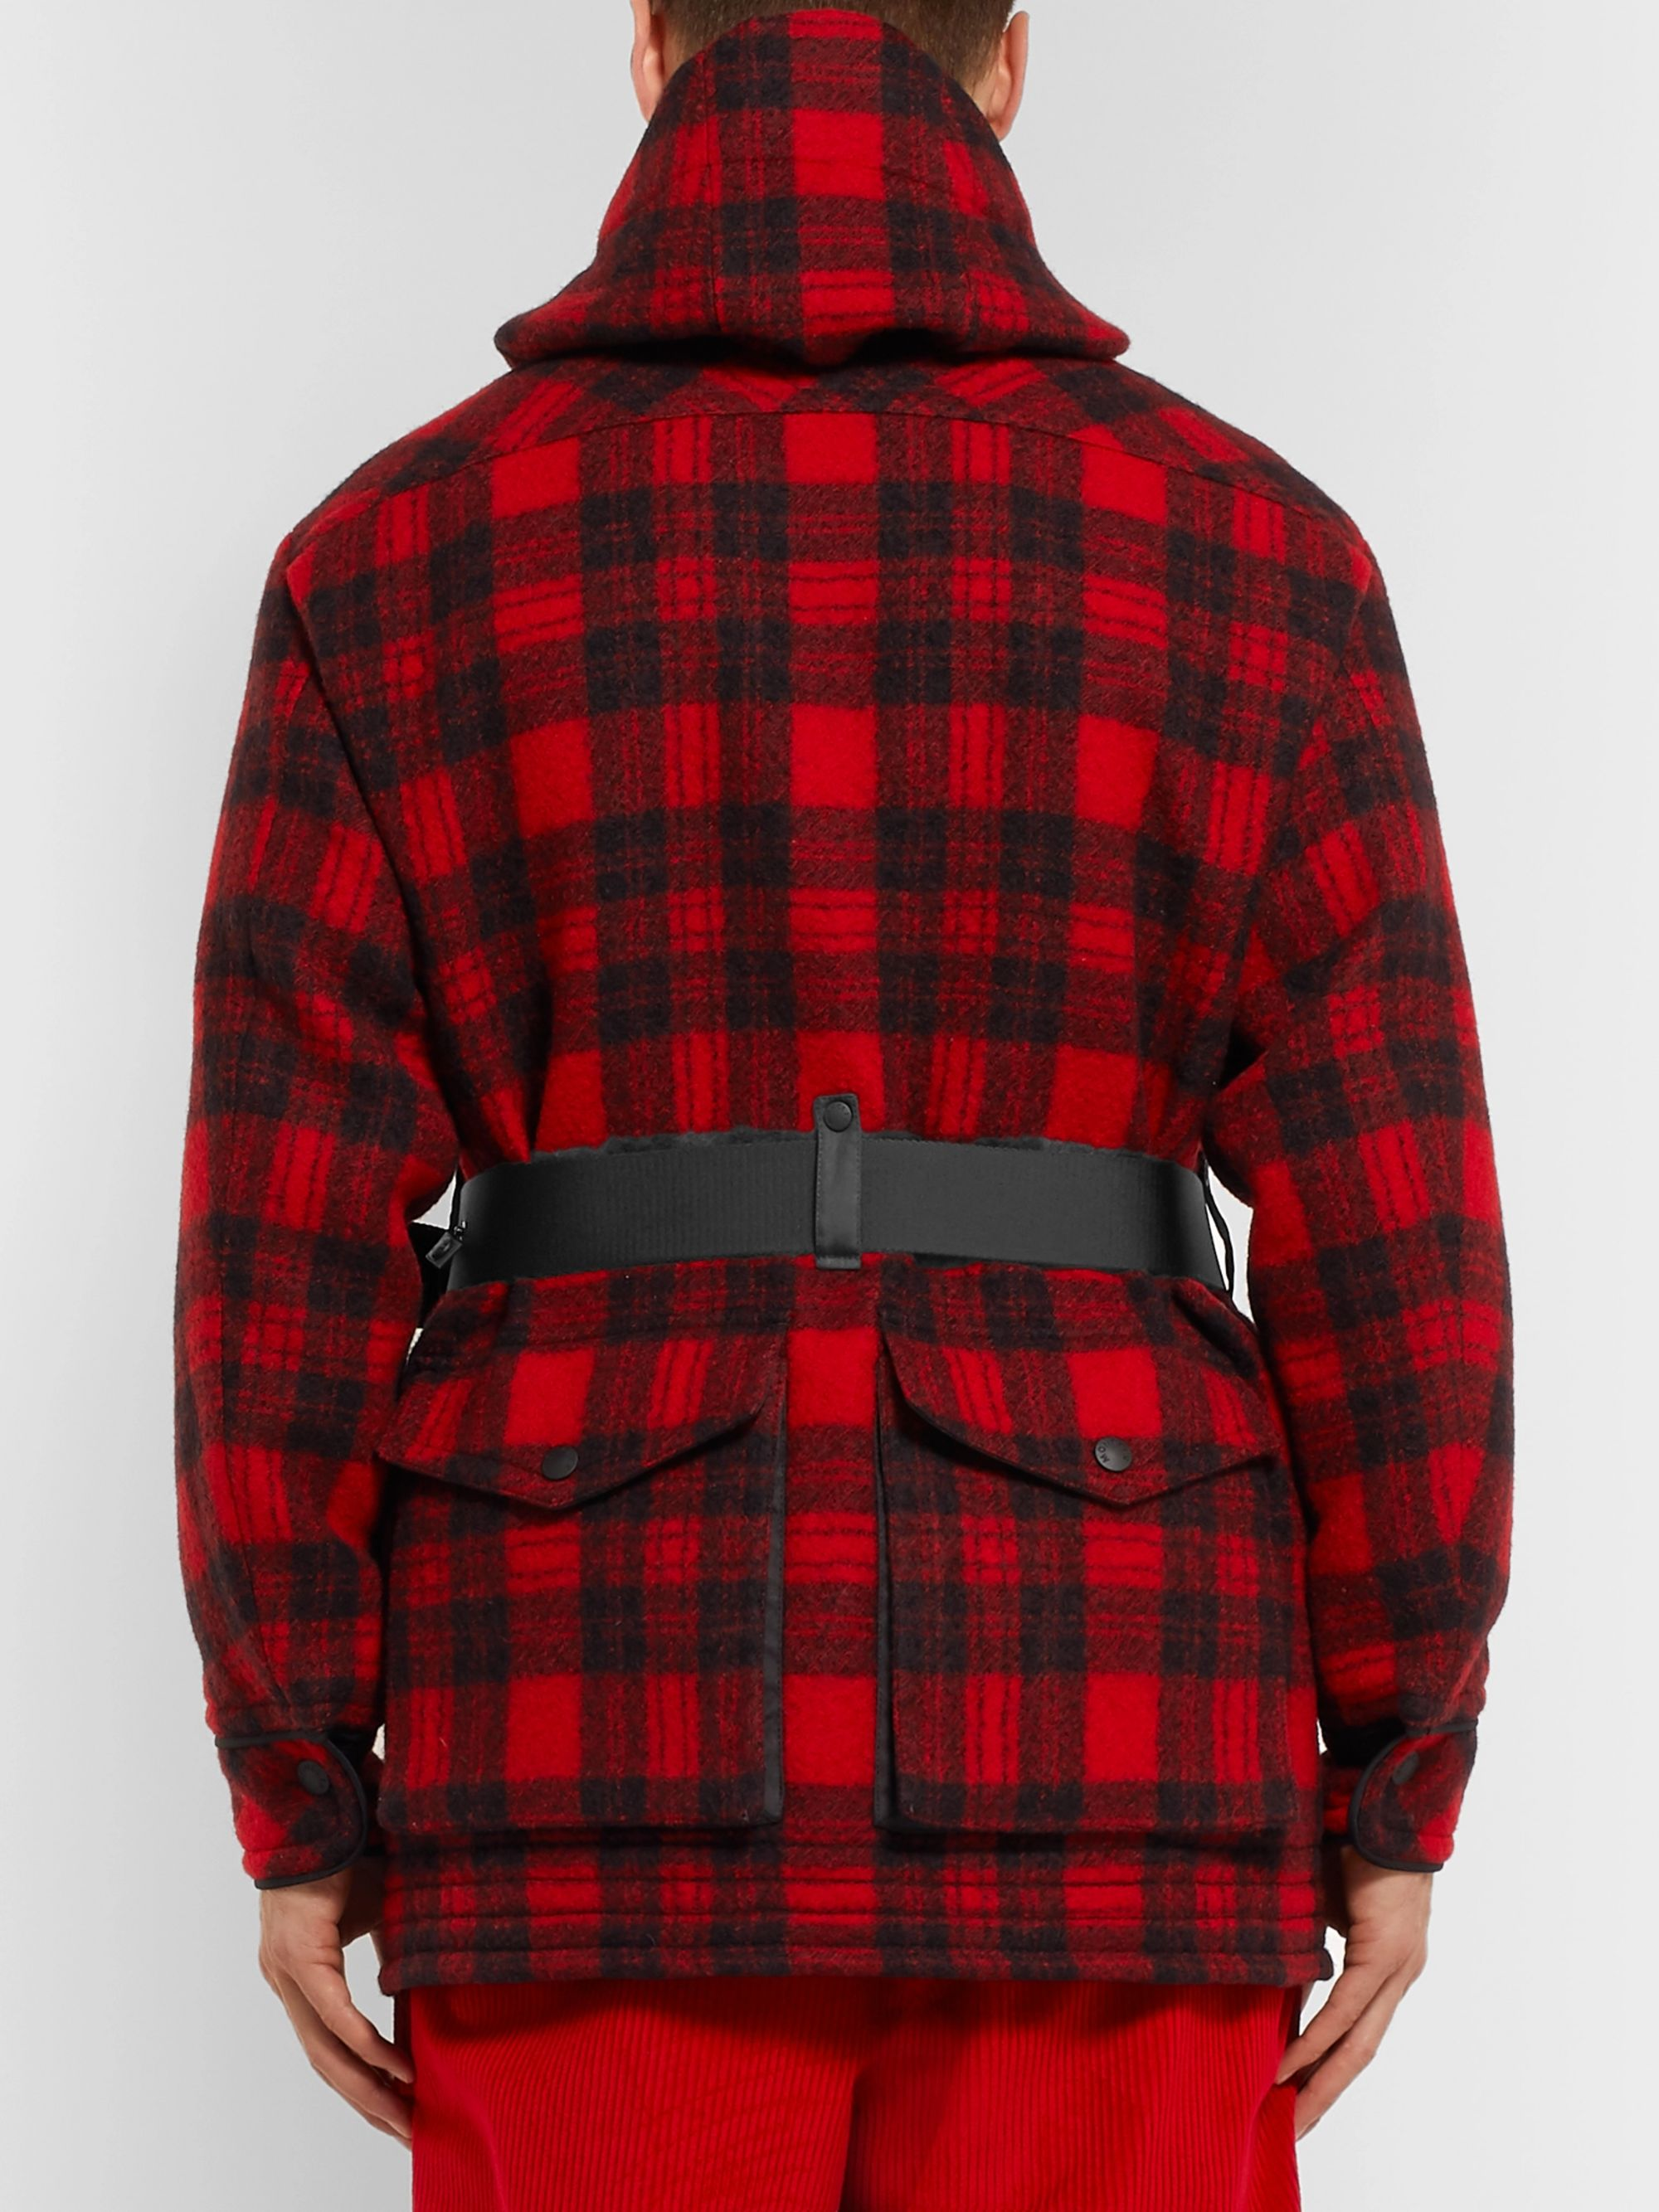 52bd6c441 3 Moncler Grenoble Stowe Checked Virgin Wool Hooded Down Ski Jacket